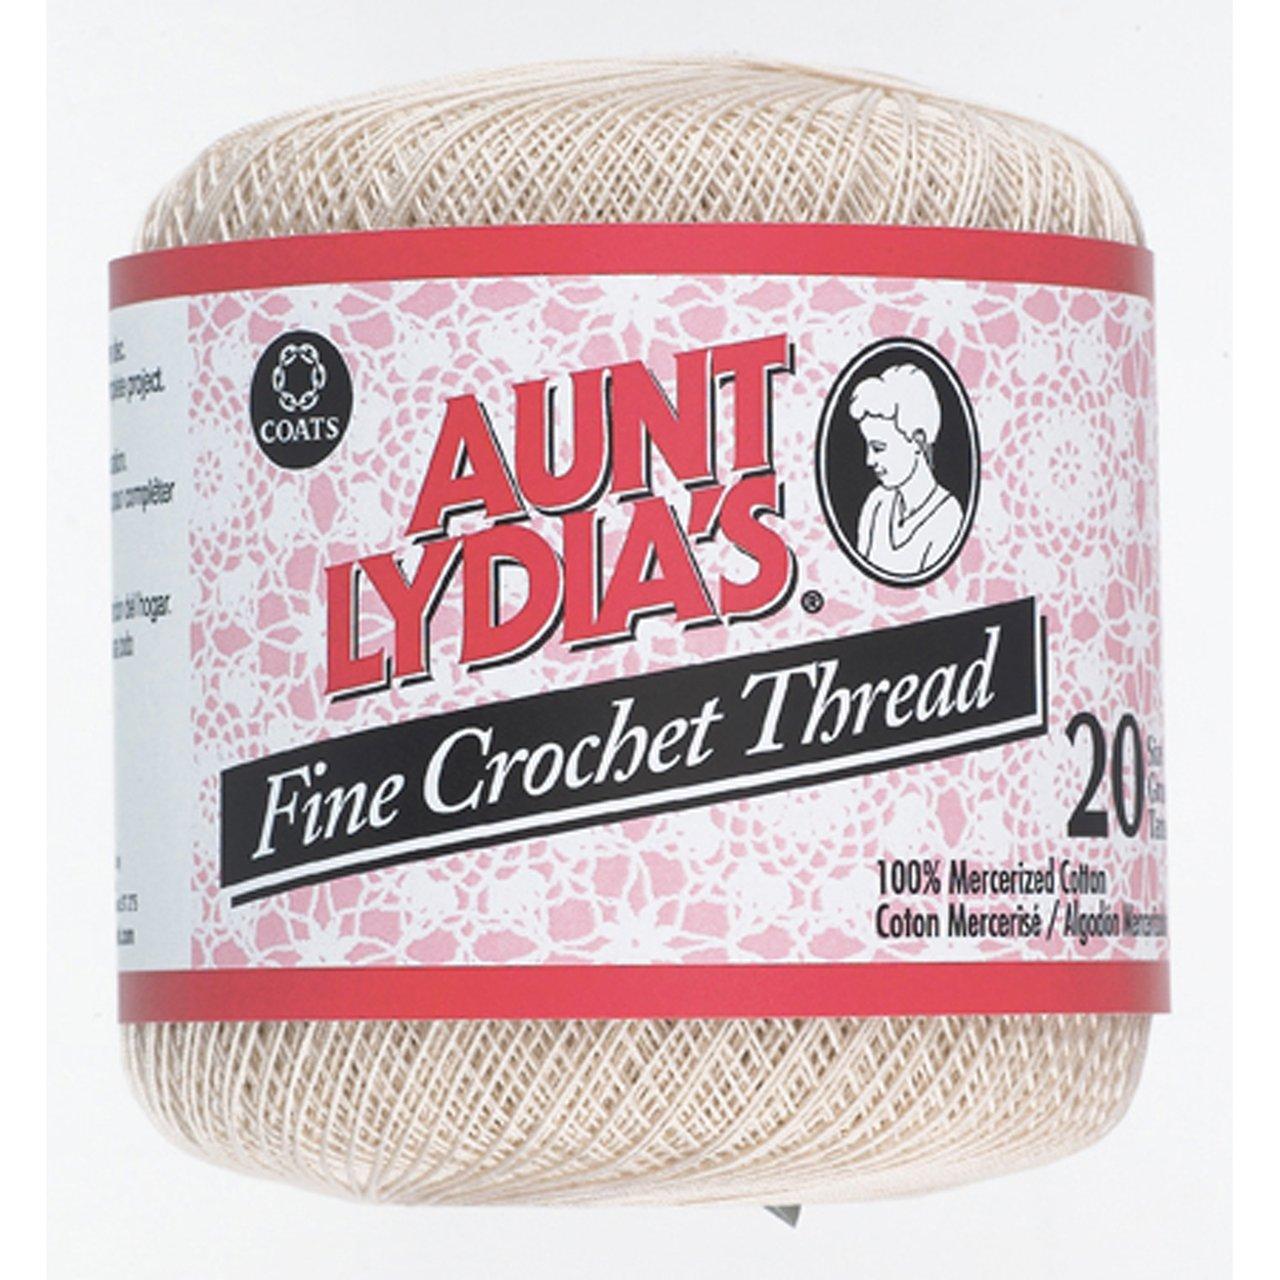 Aunt Lydia'S Fine Crochet Thread, Natural, 400 Yds - 3 Pkgs by Aunt Lydia's (Image #2)